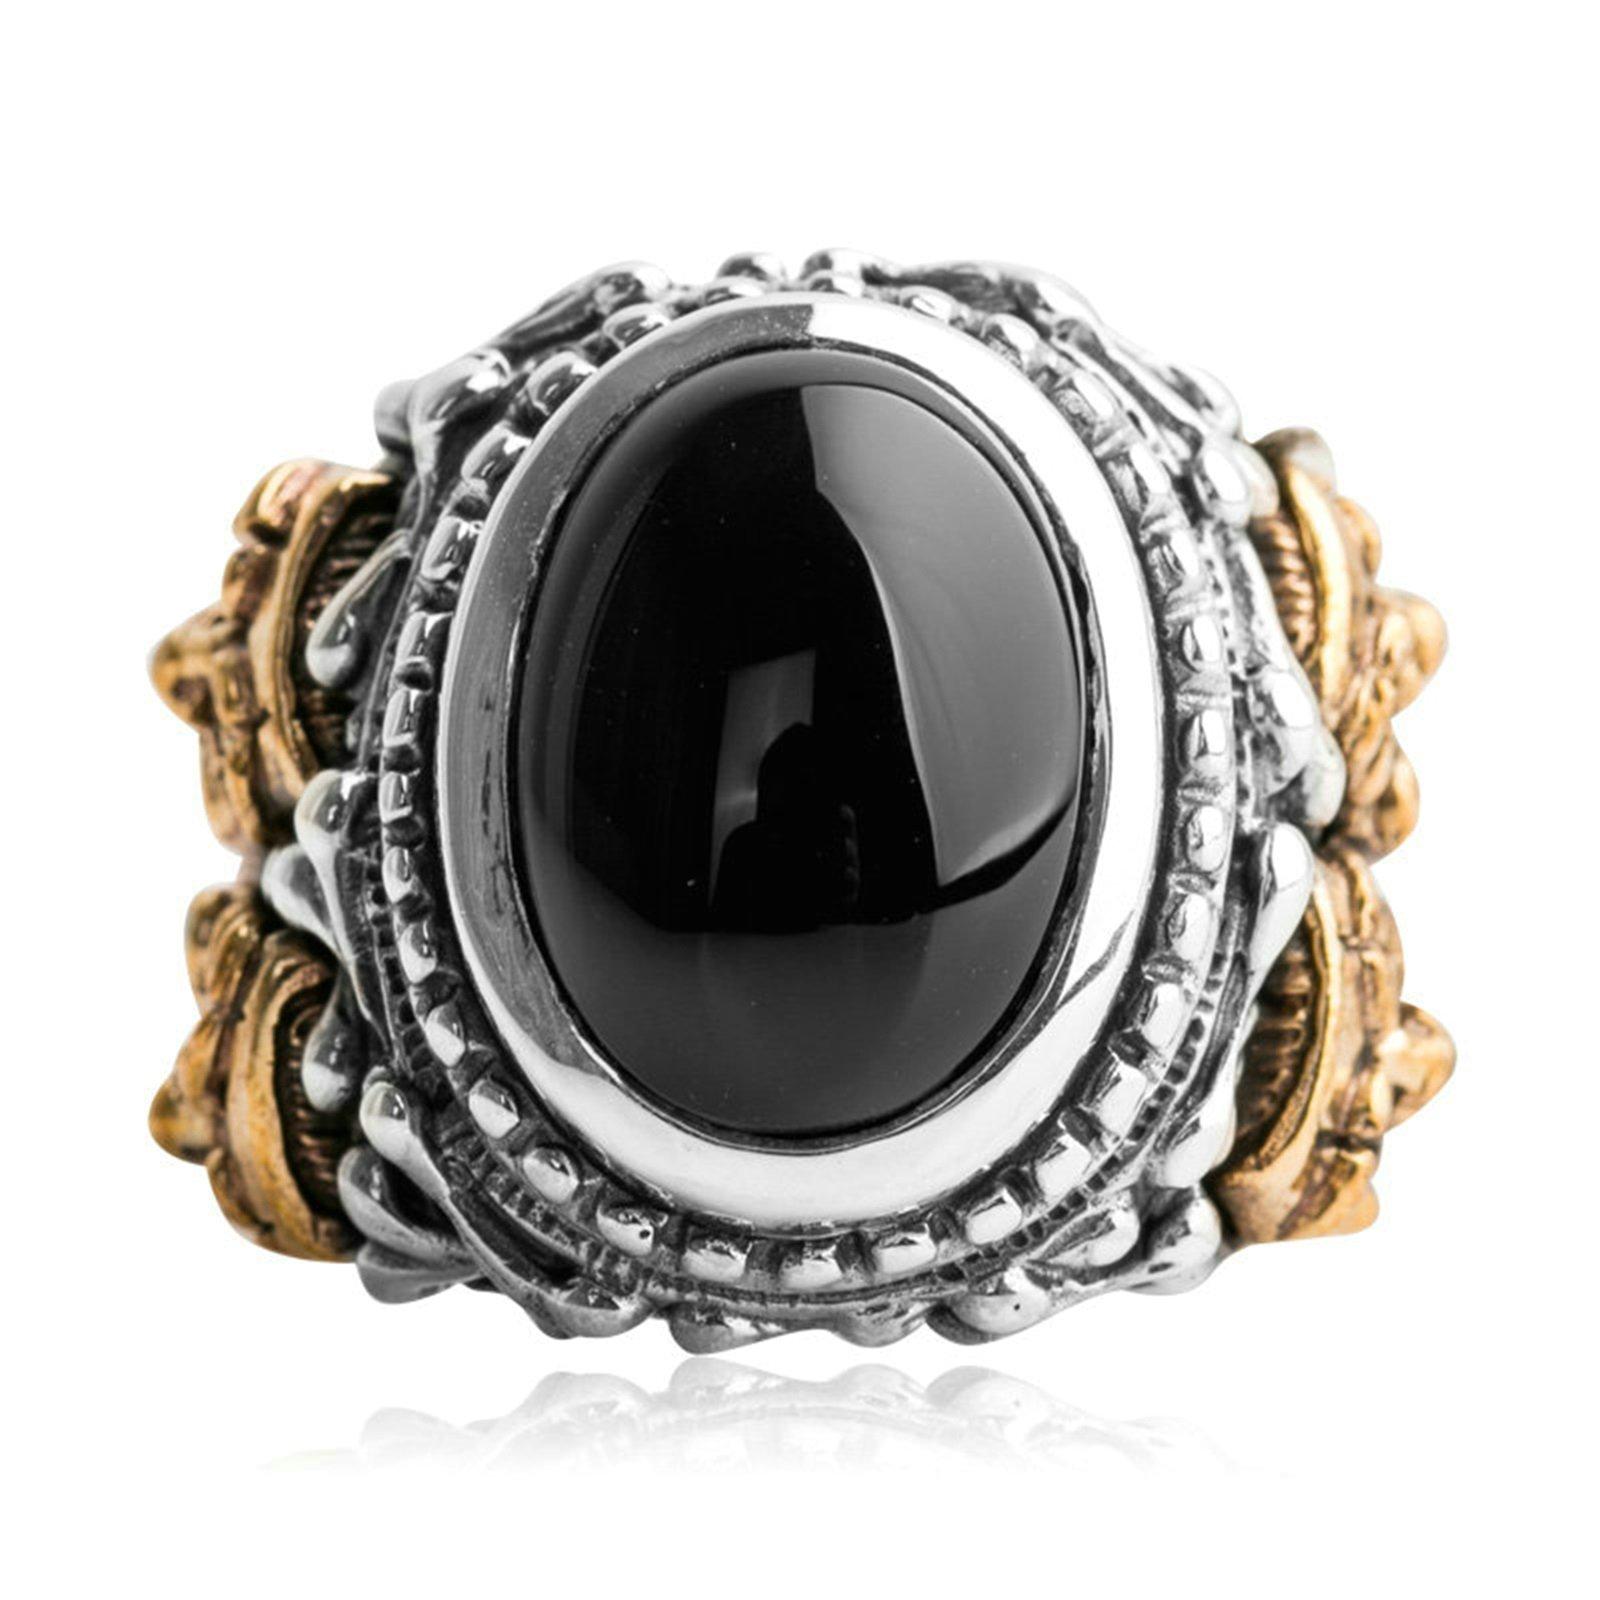 Beydodo Mens Silver Ring, Black Onyx Joker Ring Size 11 Punk Biker Ring Bands